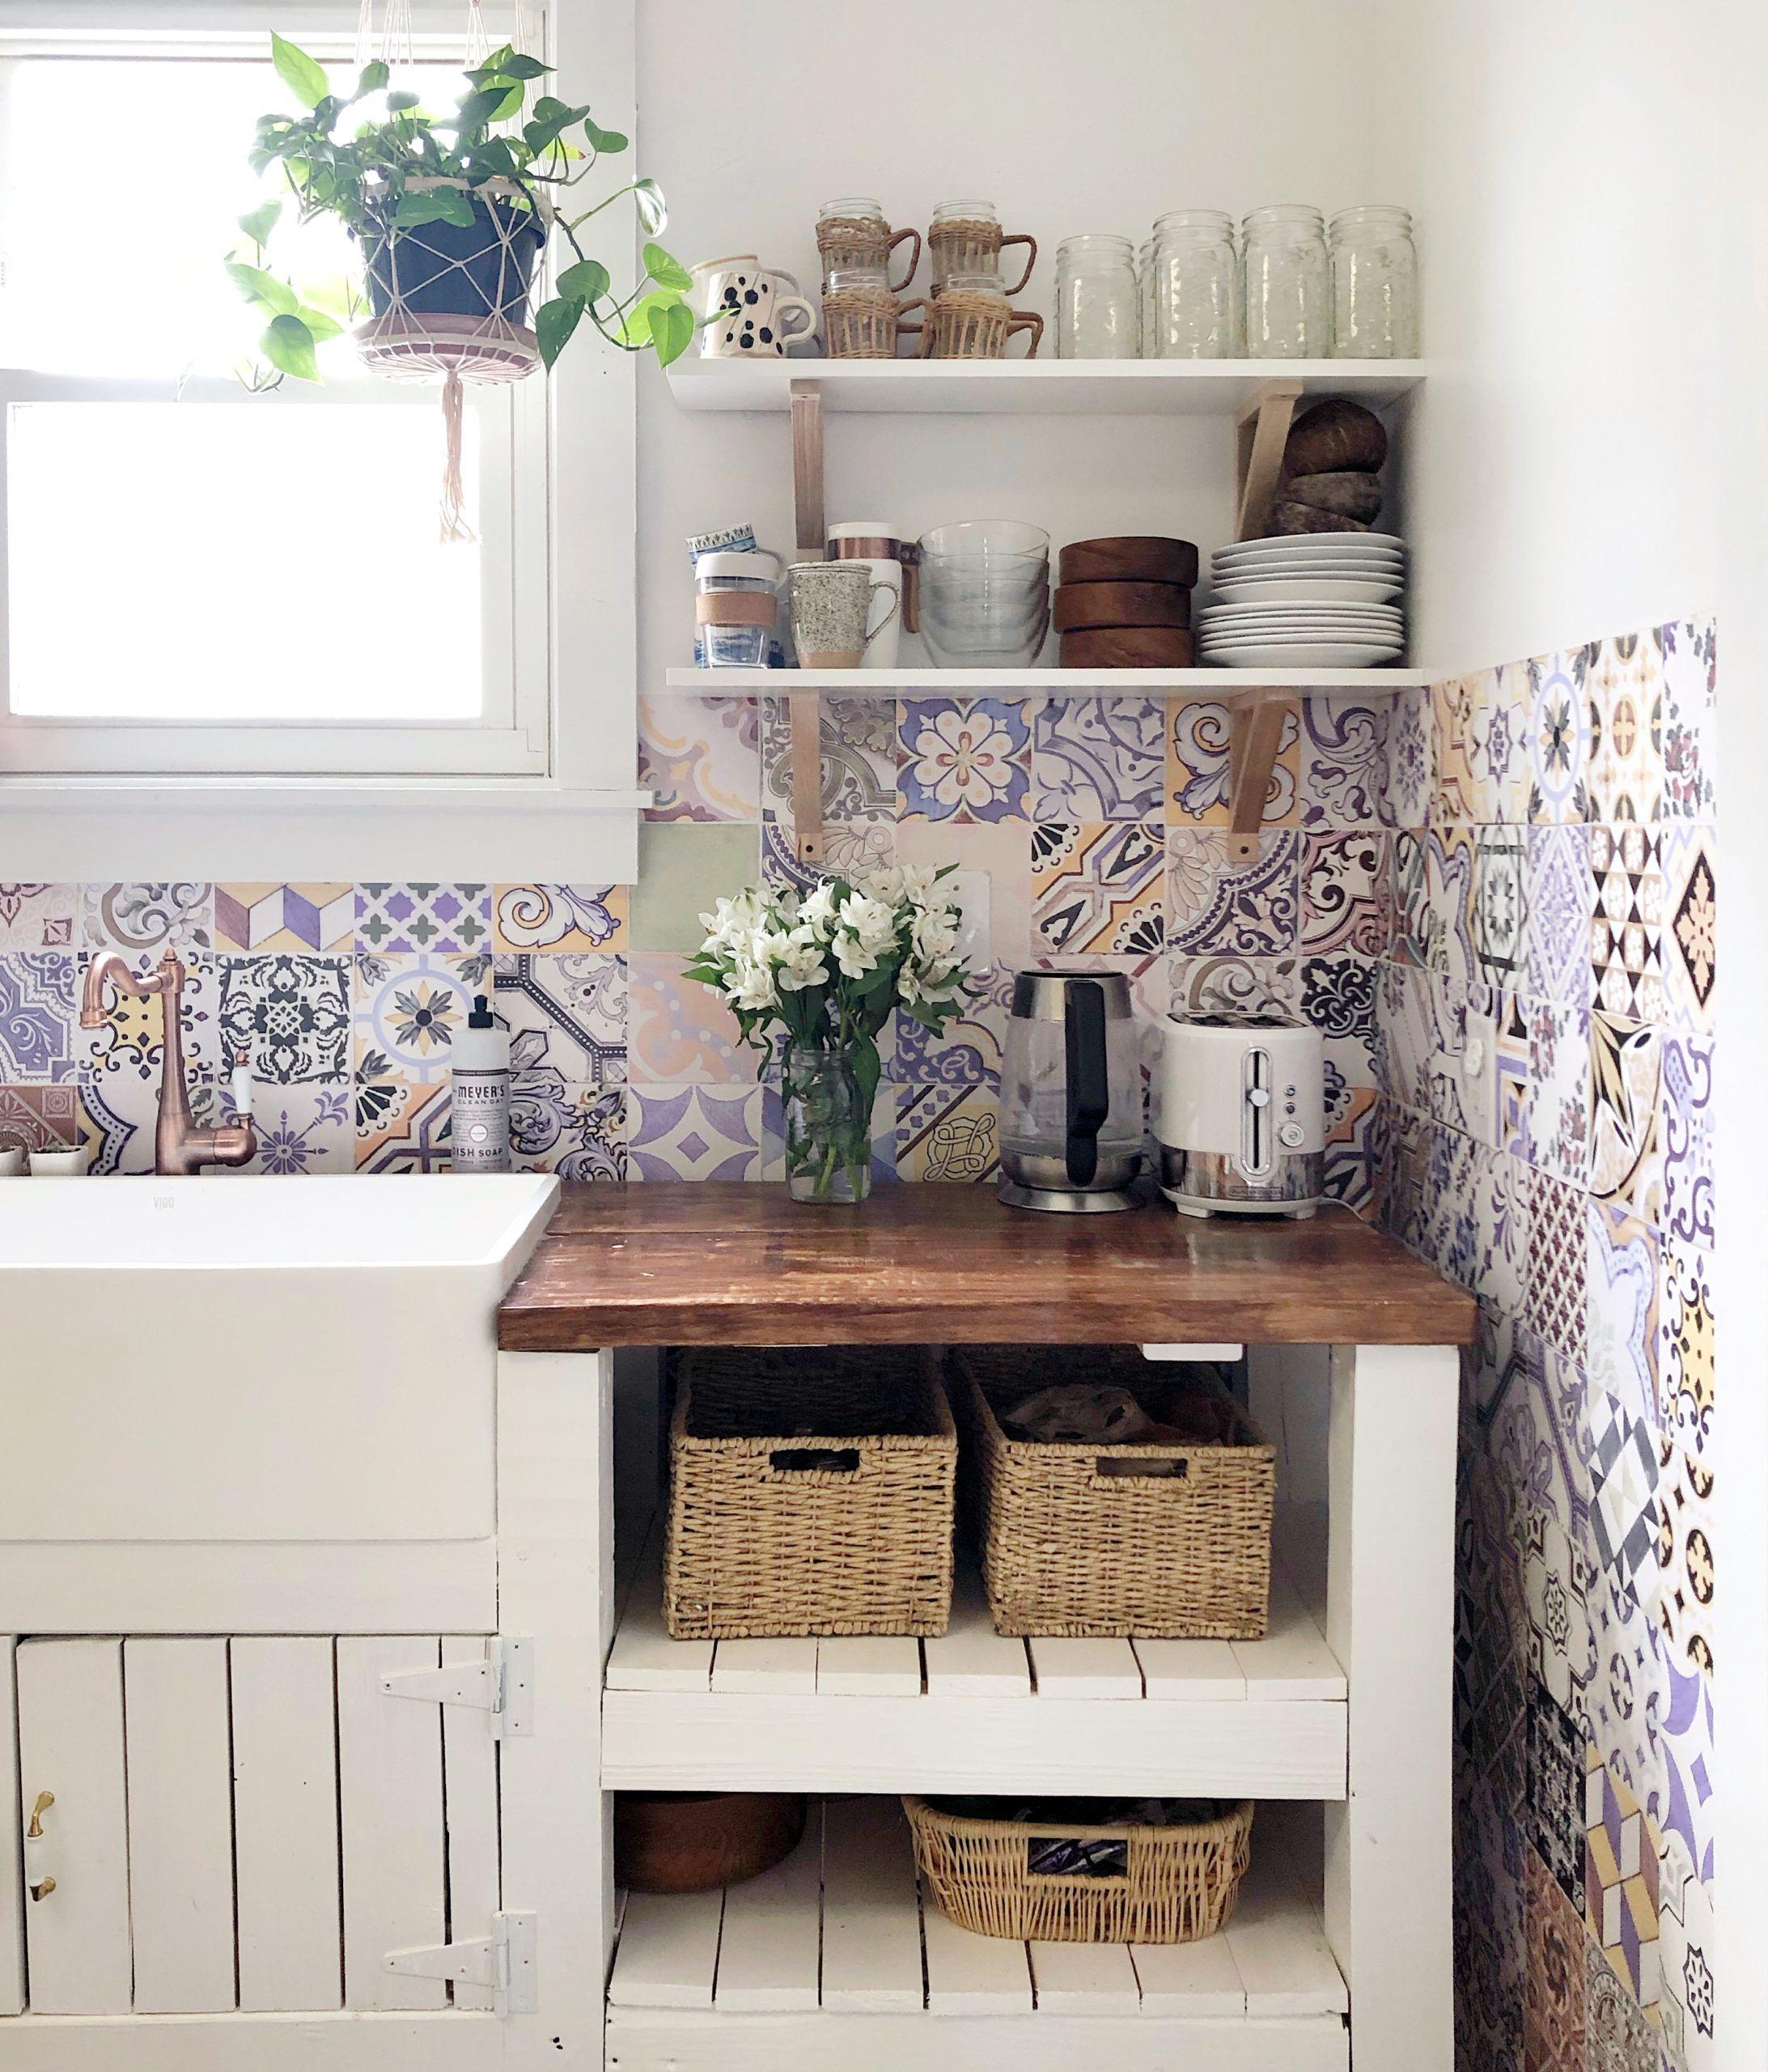 Federation Tiles Wallpaper • Kitchen Wallpaper